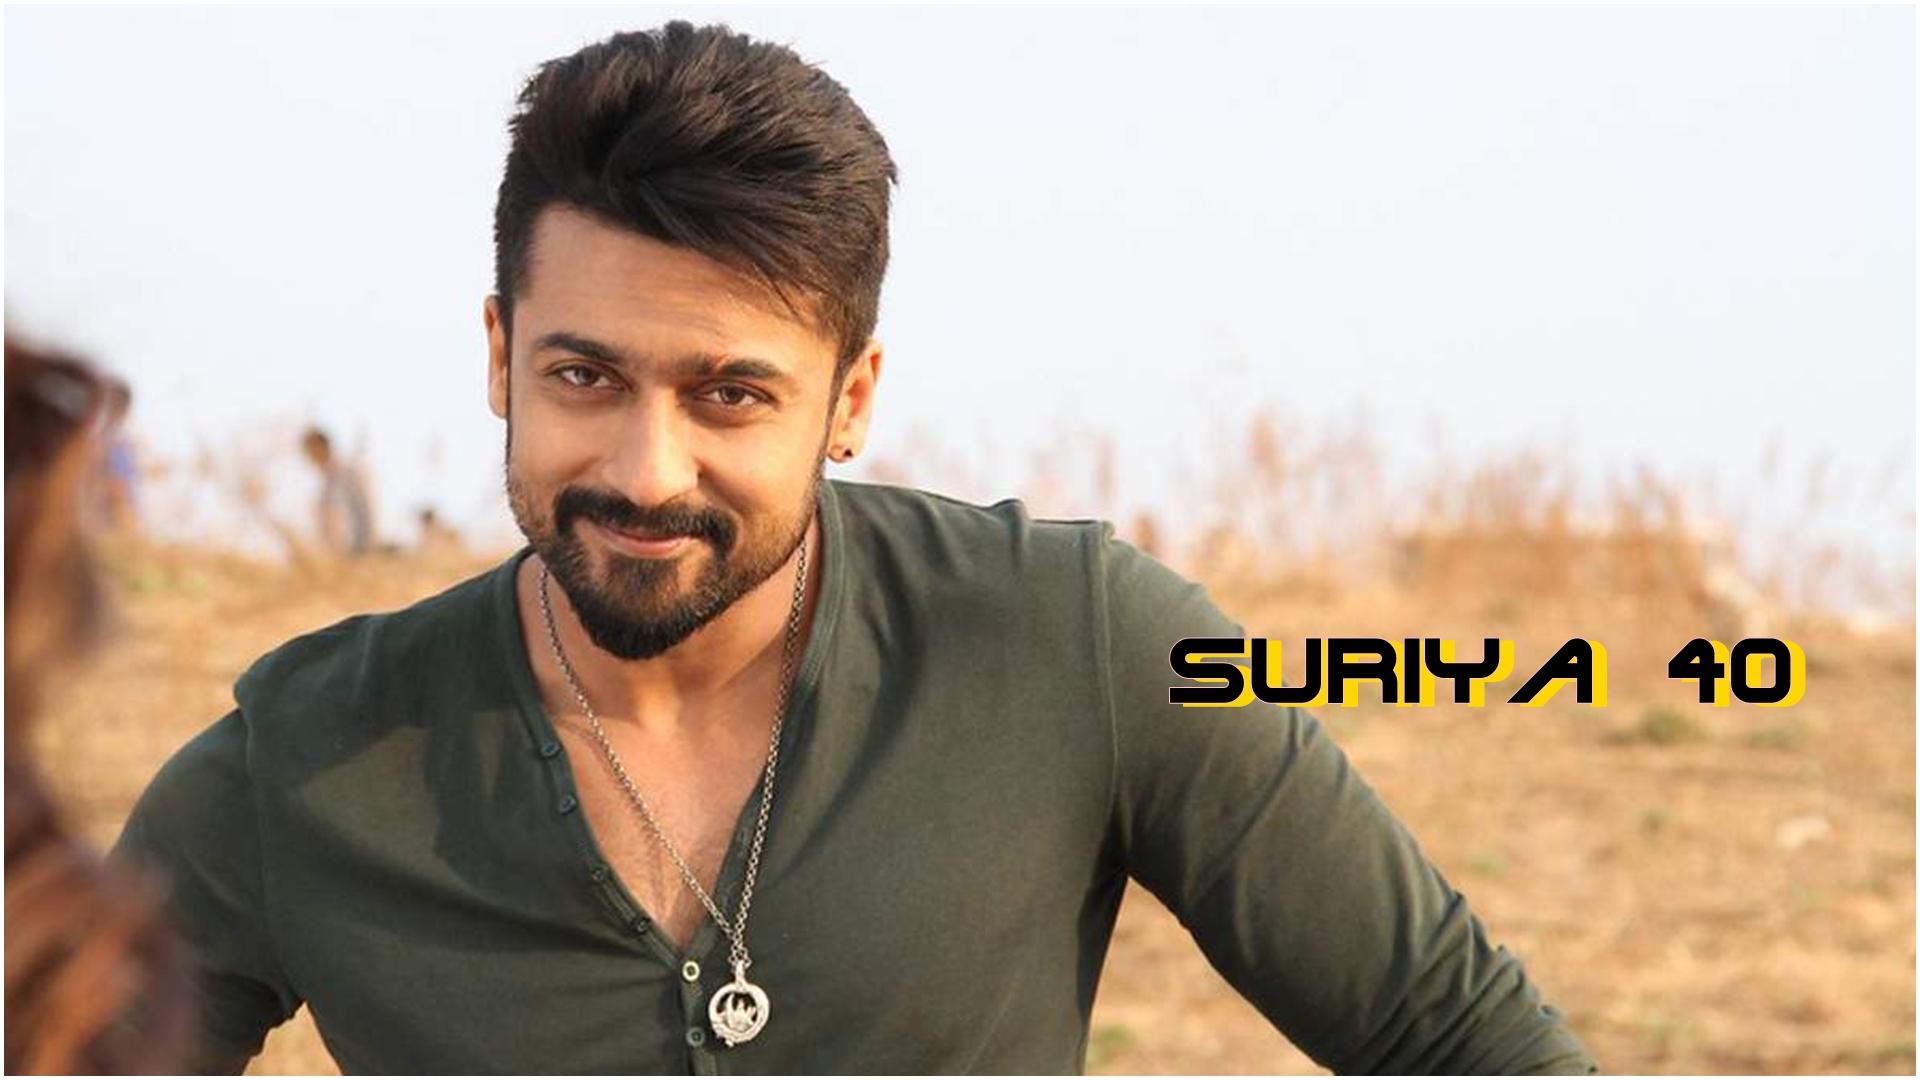 Suriya 40 latest update